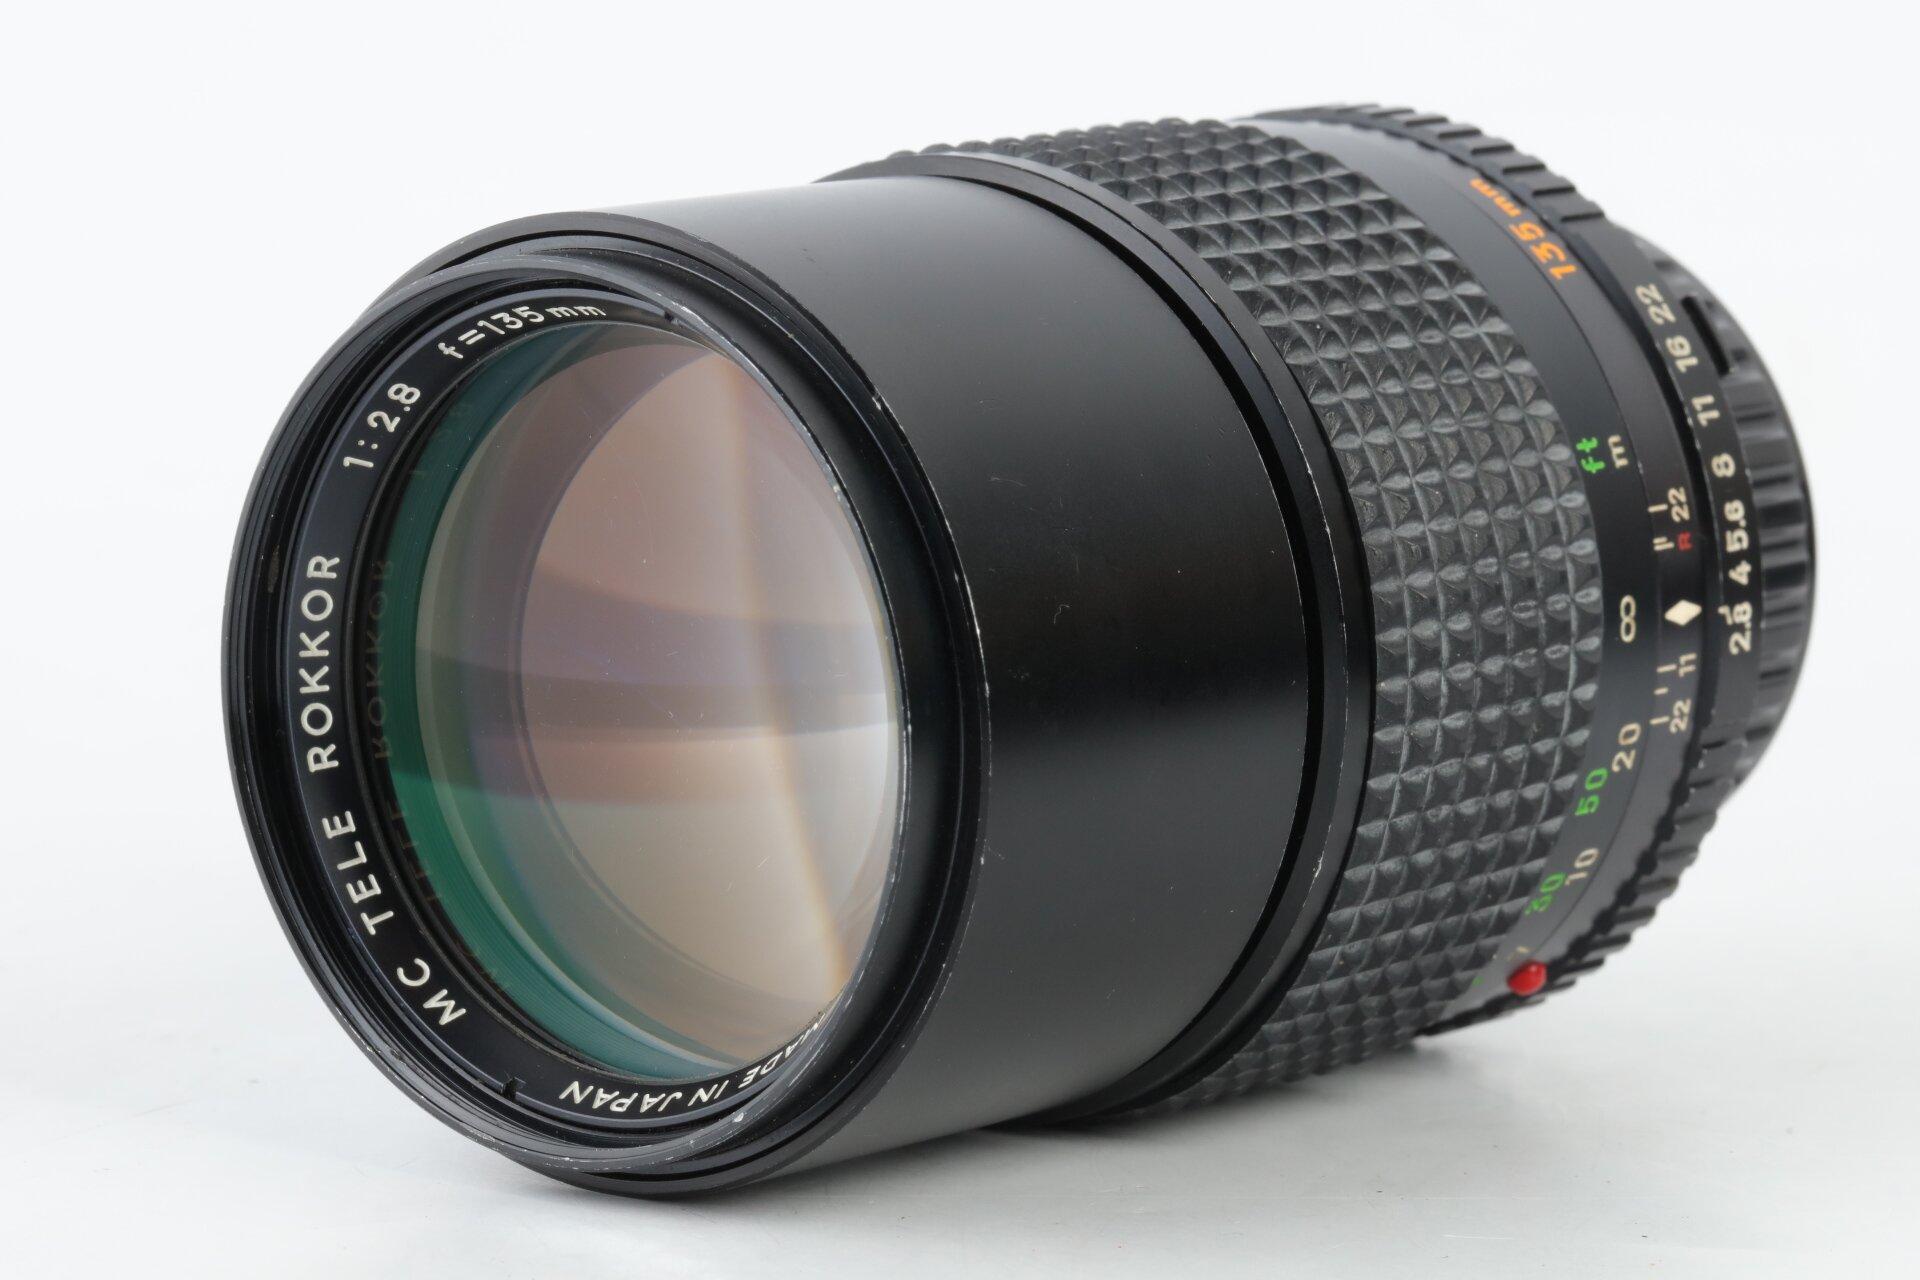 Minolta MD MC Tele Rokkor 2,8/135mm